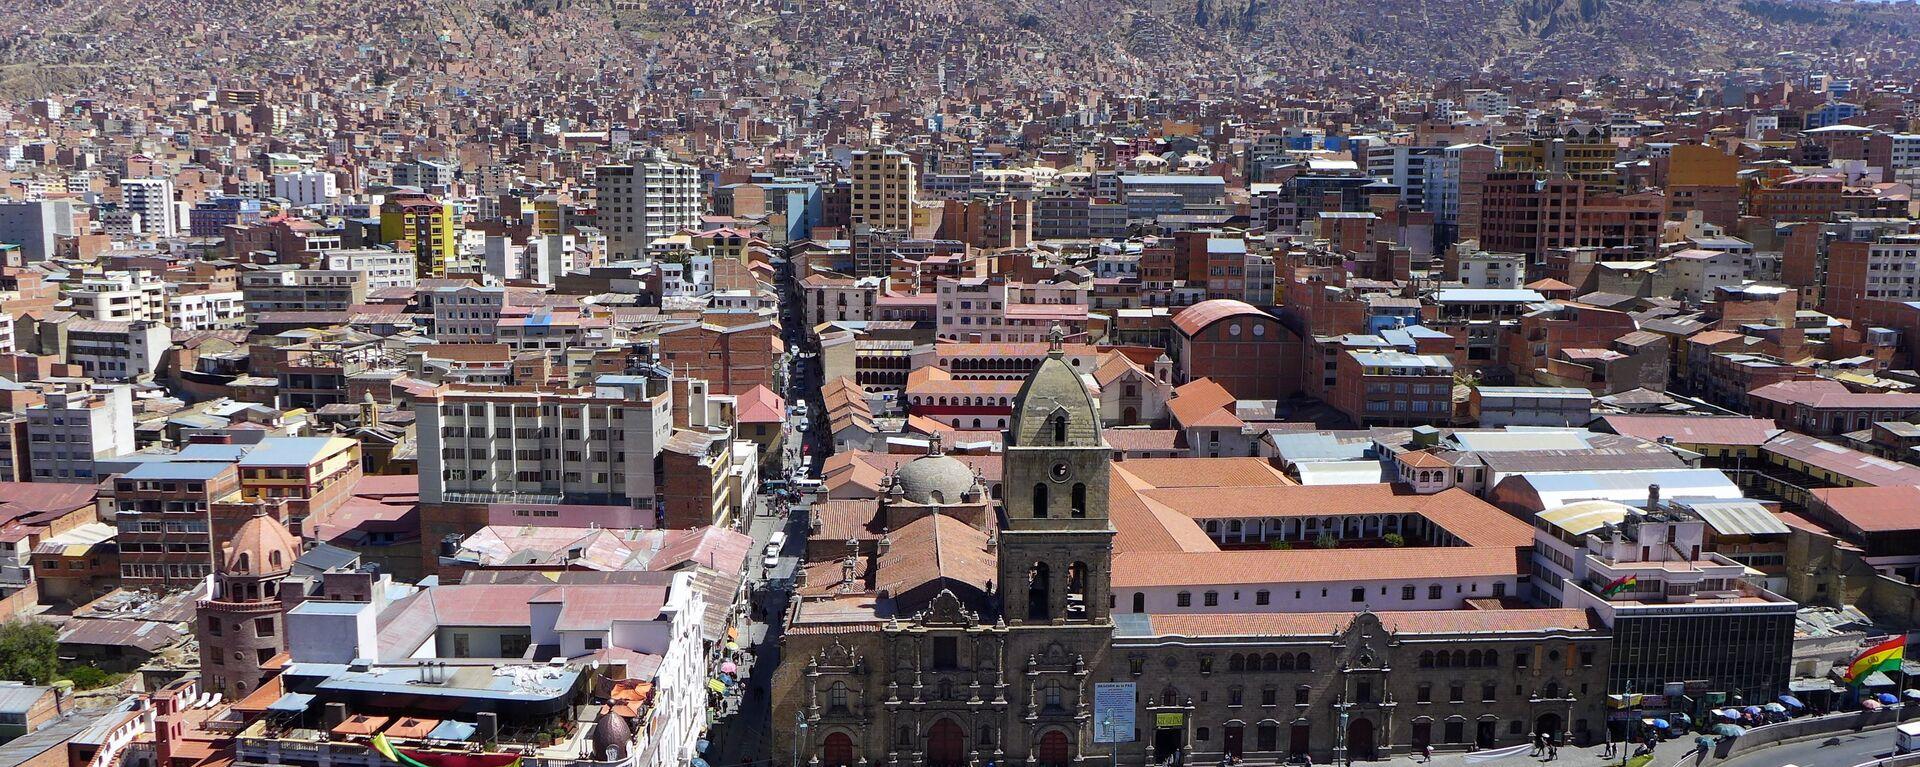 La Paz, la capital de Bolivia - Sputnik Mundo, 1920, 21.05.2021